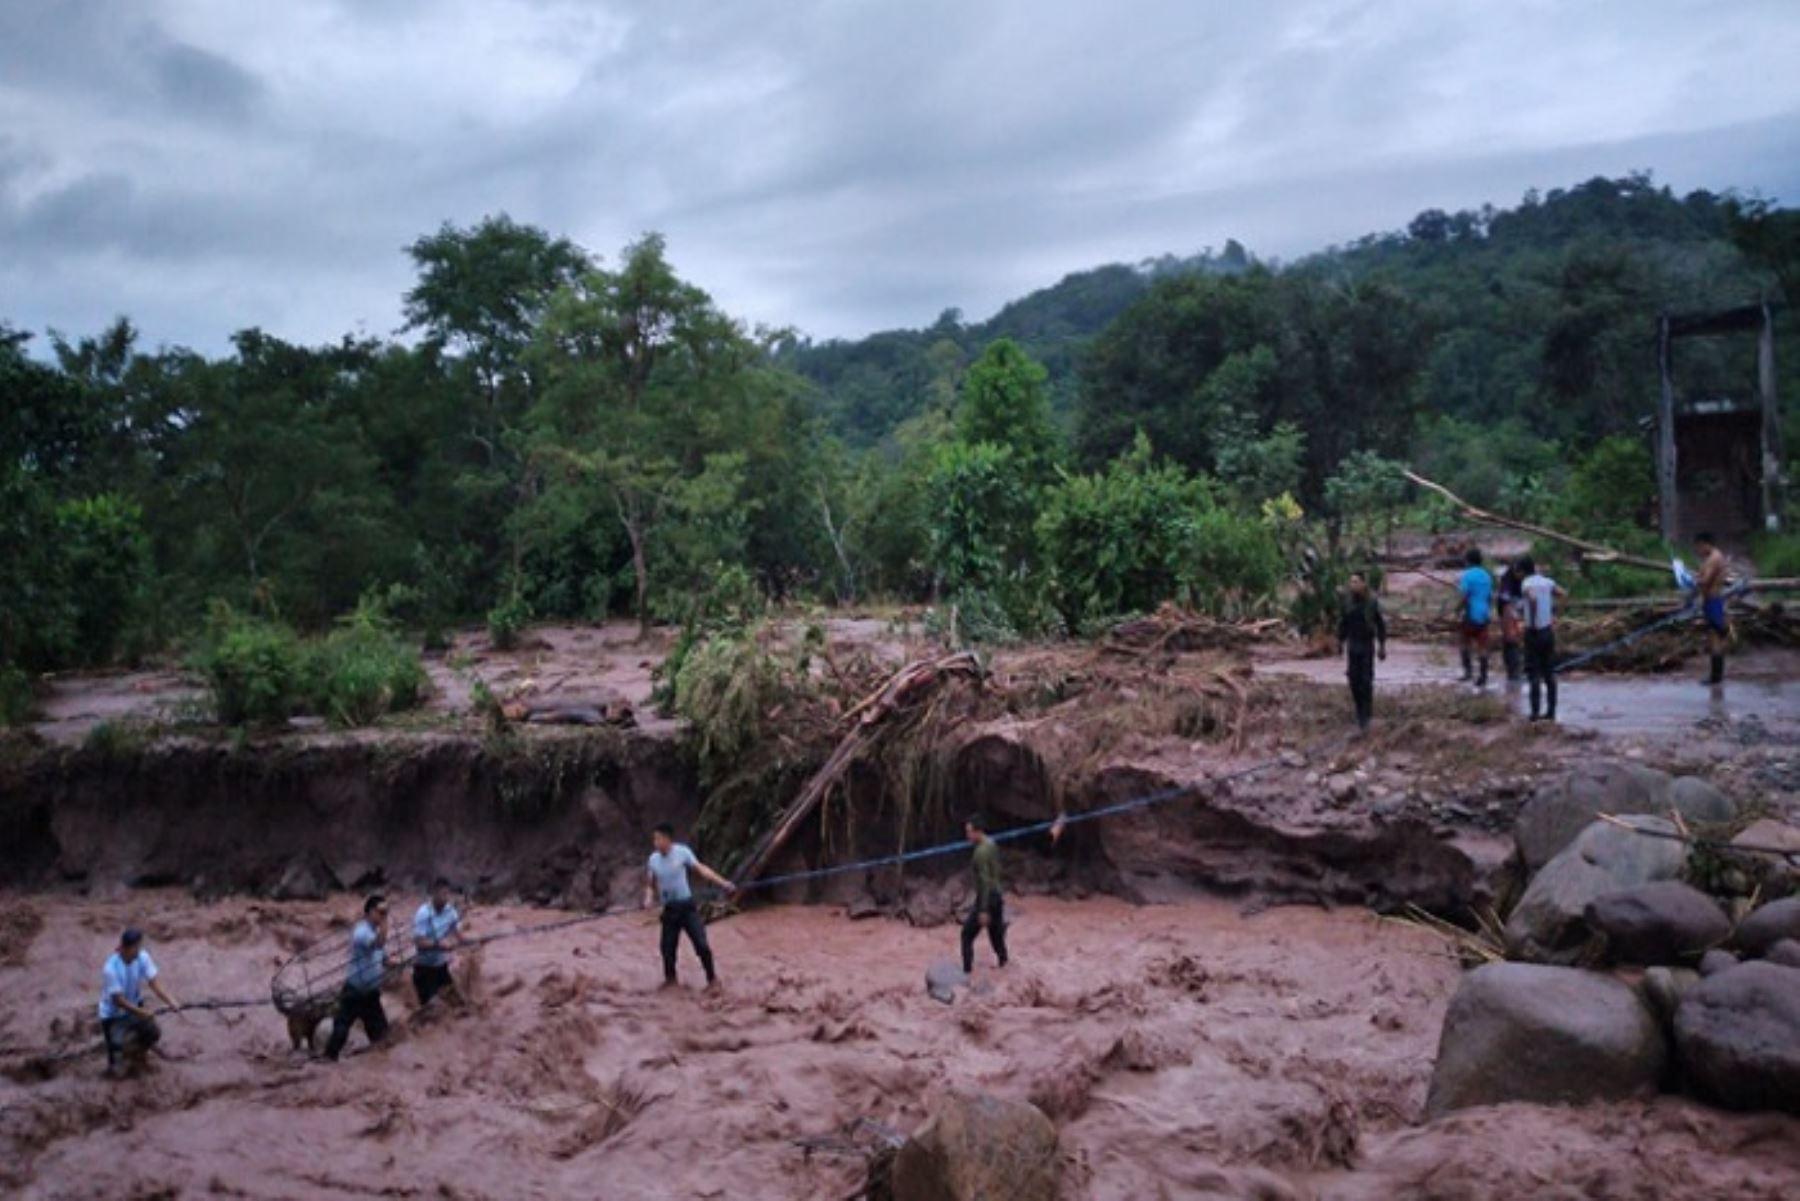 San Martín: desborde de río Ocheque daña puente vehicular y aisla a dos familias